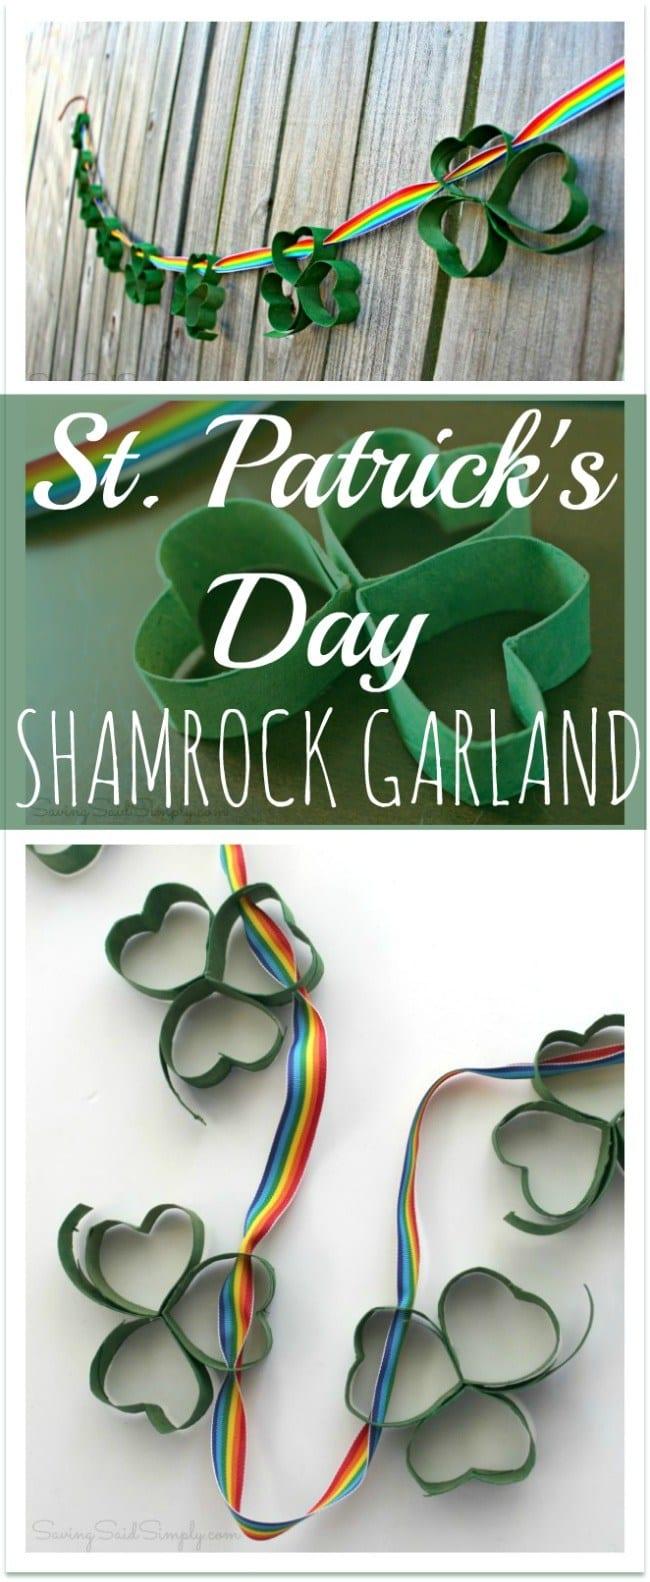 14 Simple St. Patrick's Day DIYs10